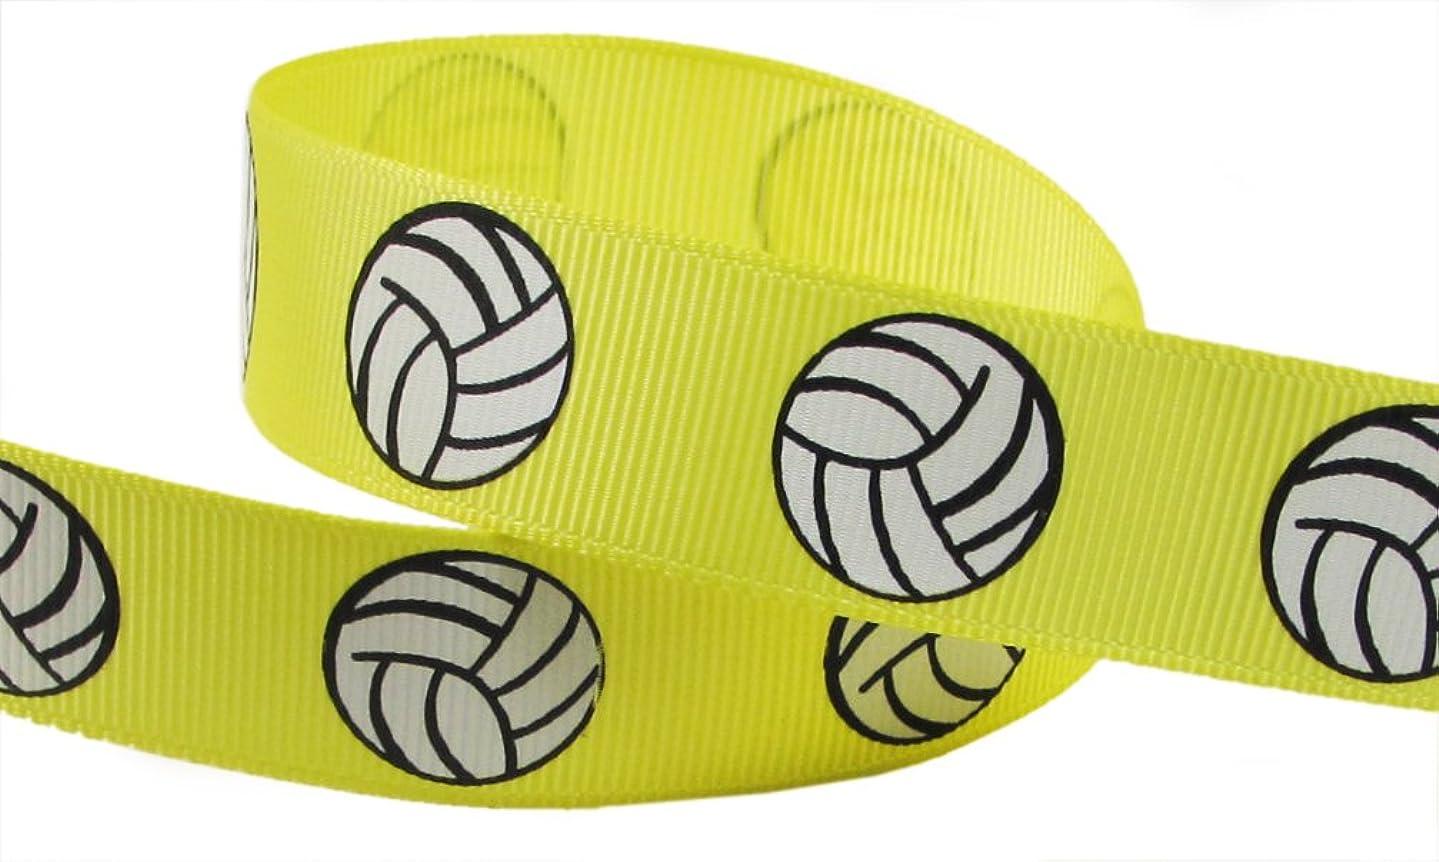 HipGirl Brand Printed Grosgrain Ribbon, 5 -Yard 7/8-Inch Volleyball Up Close, Lemon